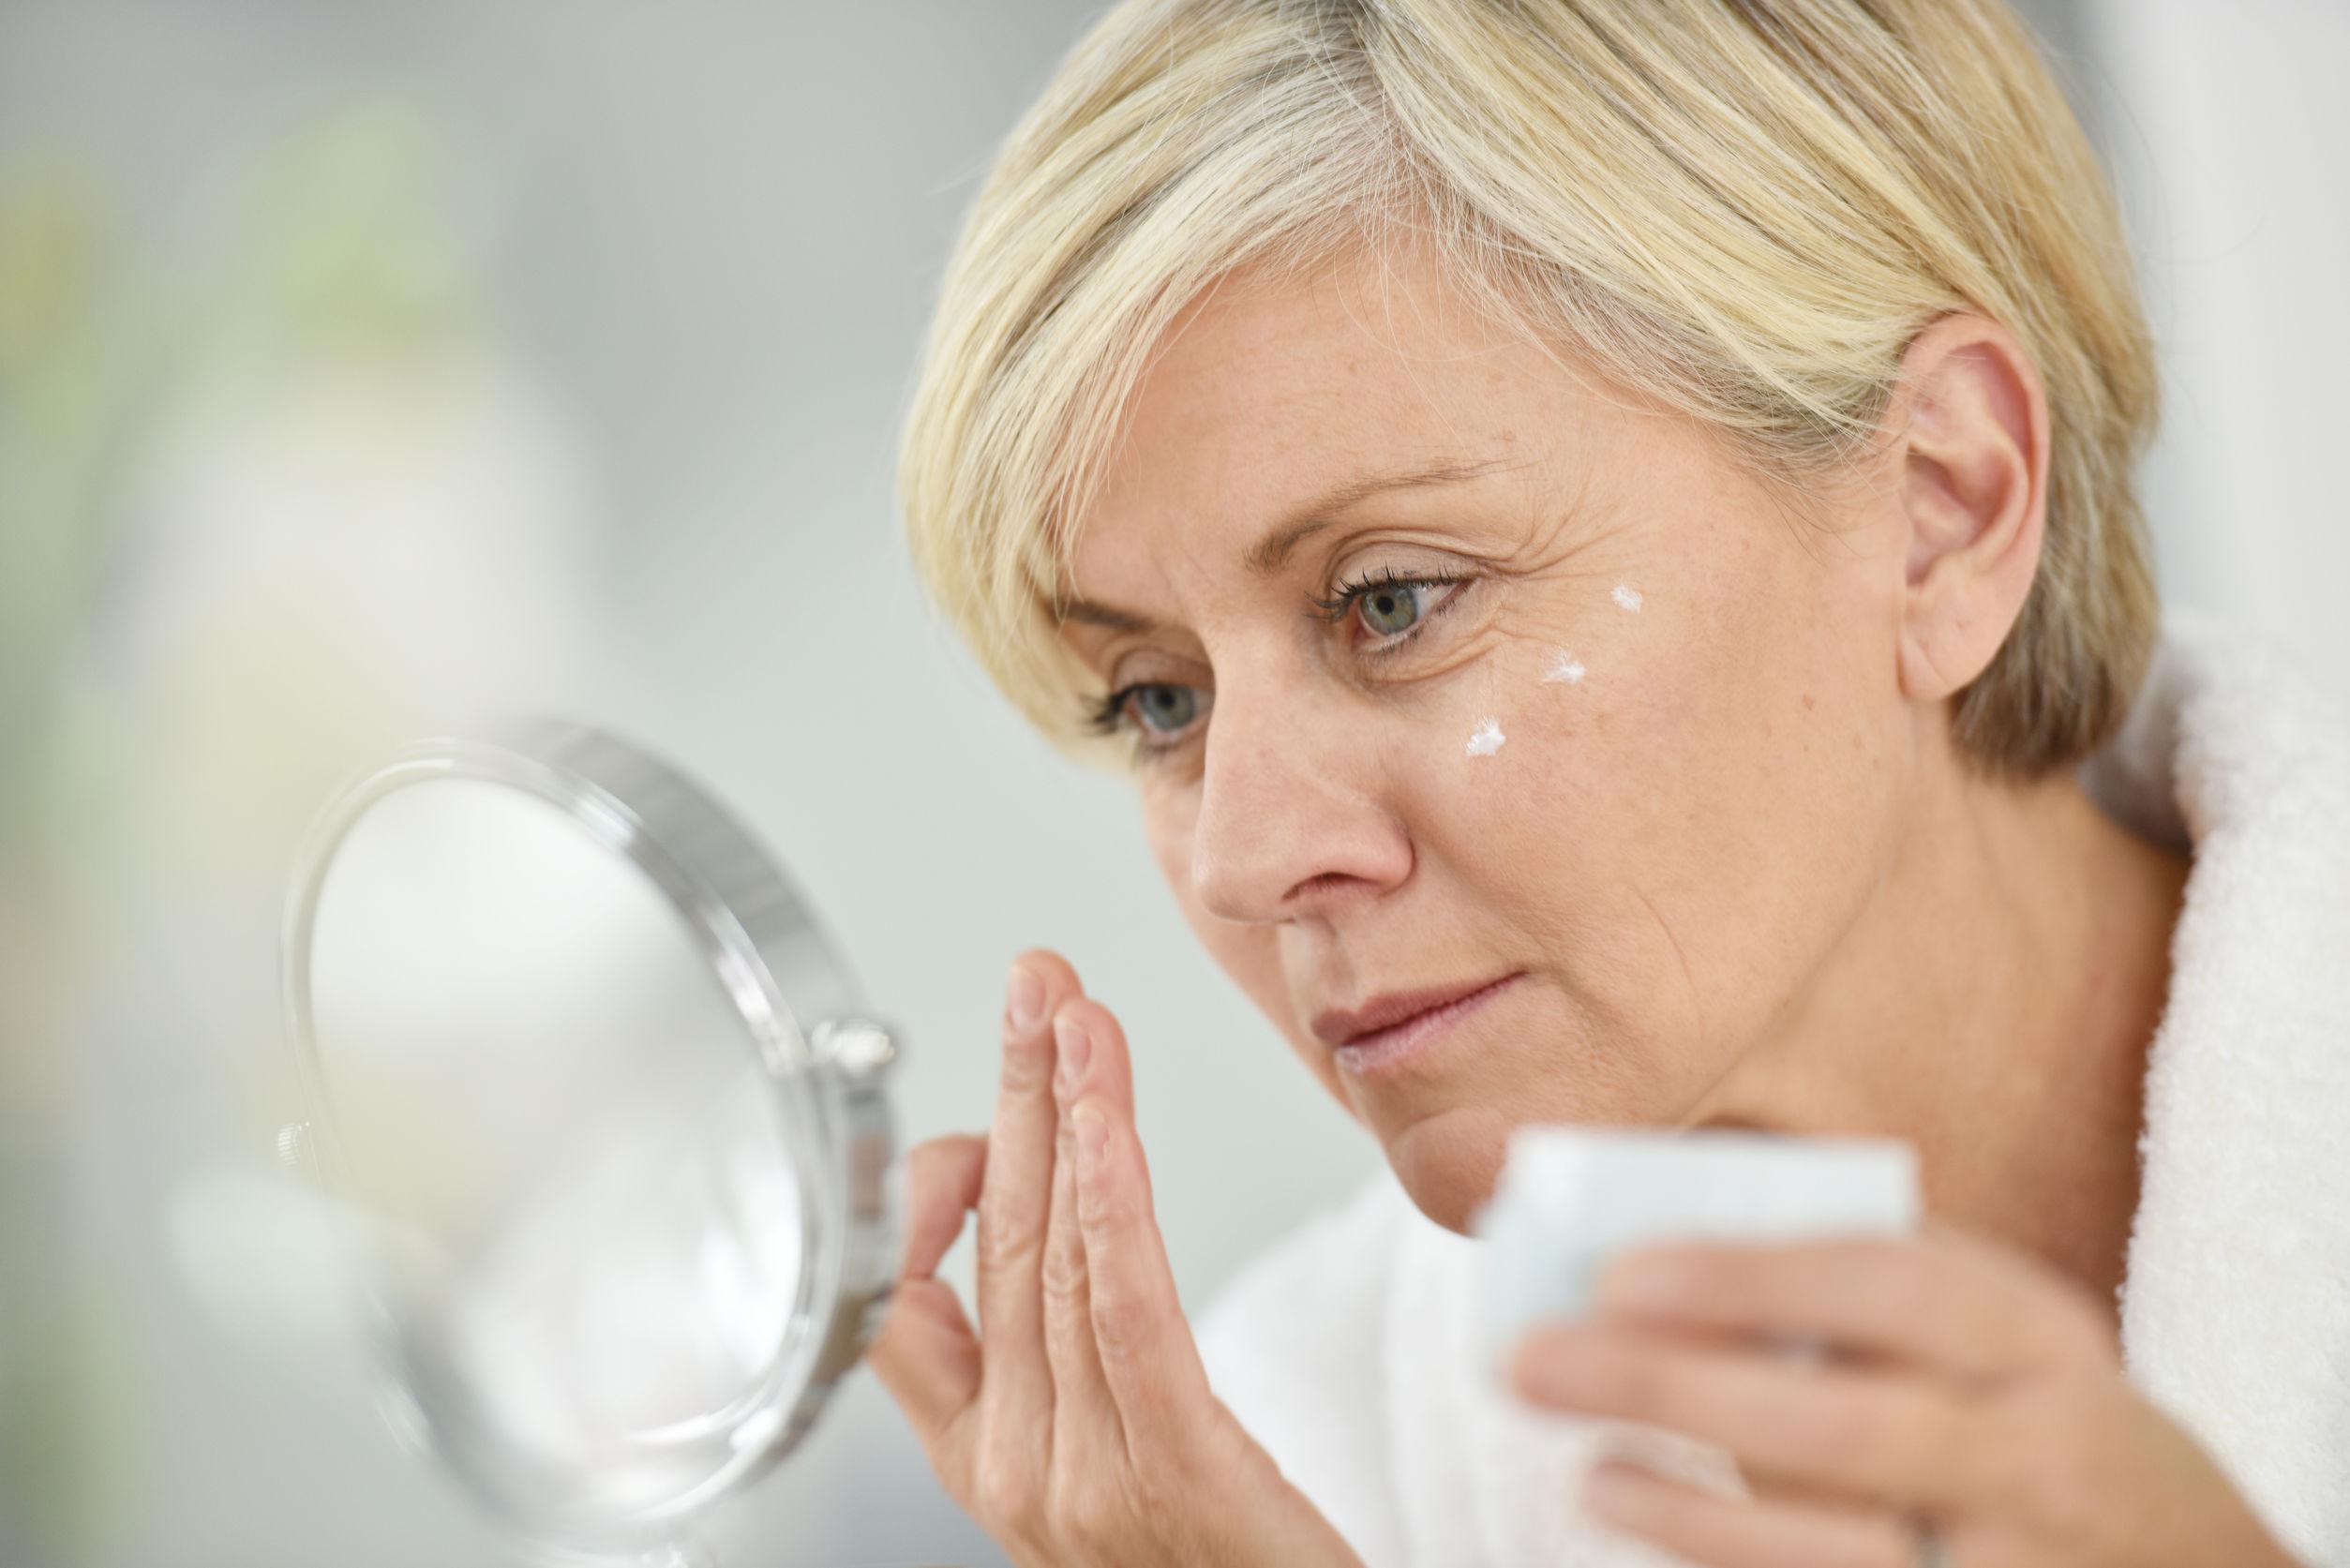 48551939 - senior woman in bathroom applying anti-aging lotion